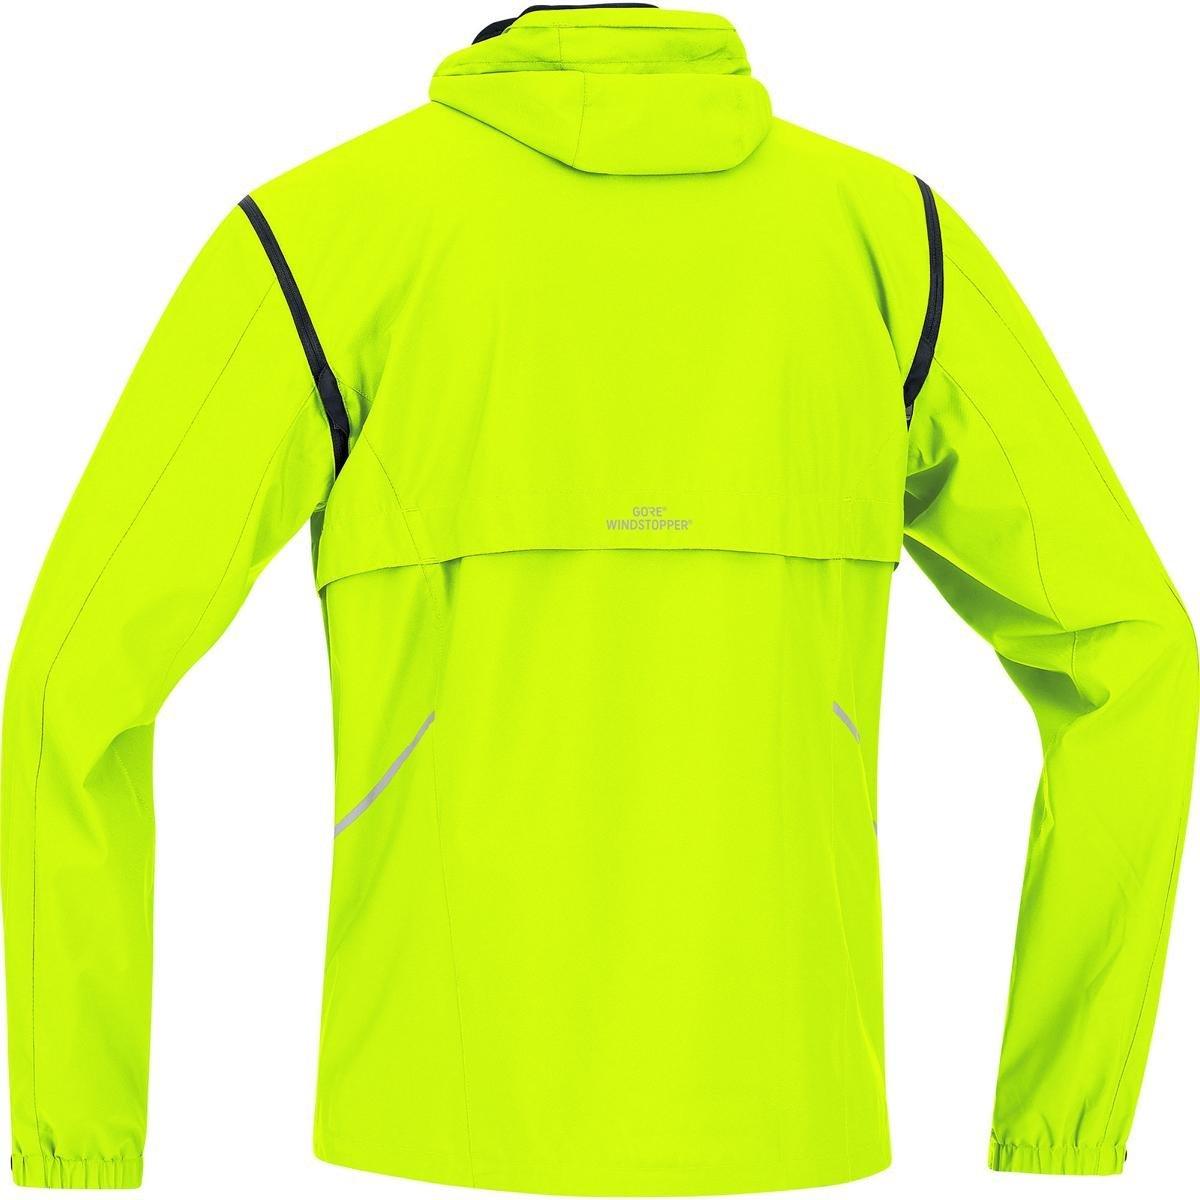 Garçon Vestes Jwesso Veste Running Wear Homme Gore R4jLA5